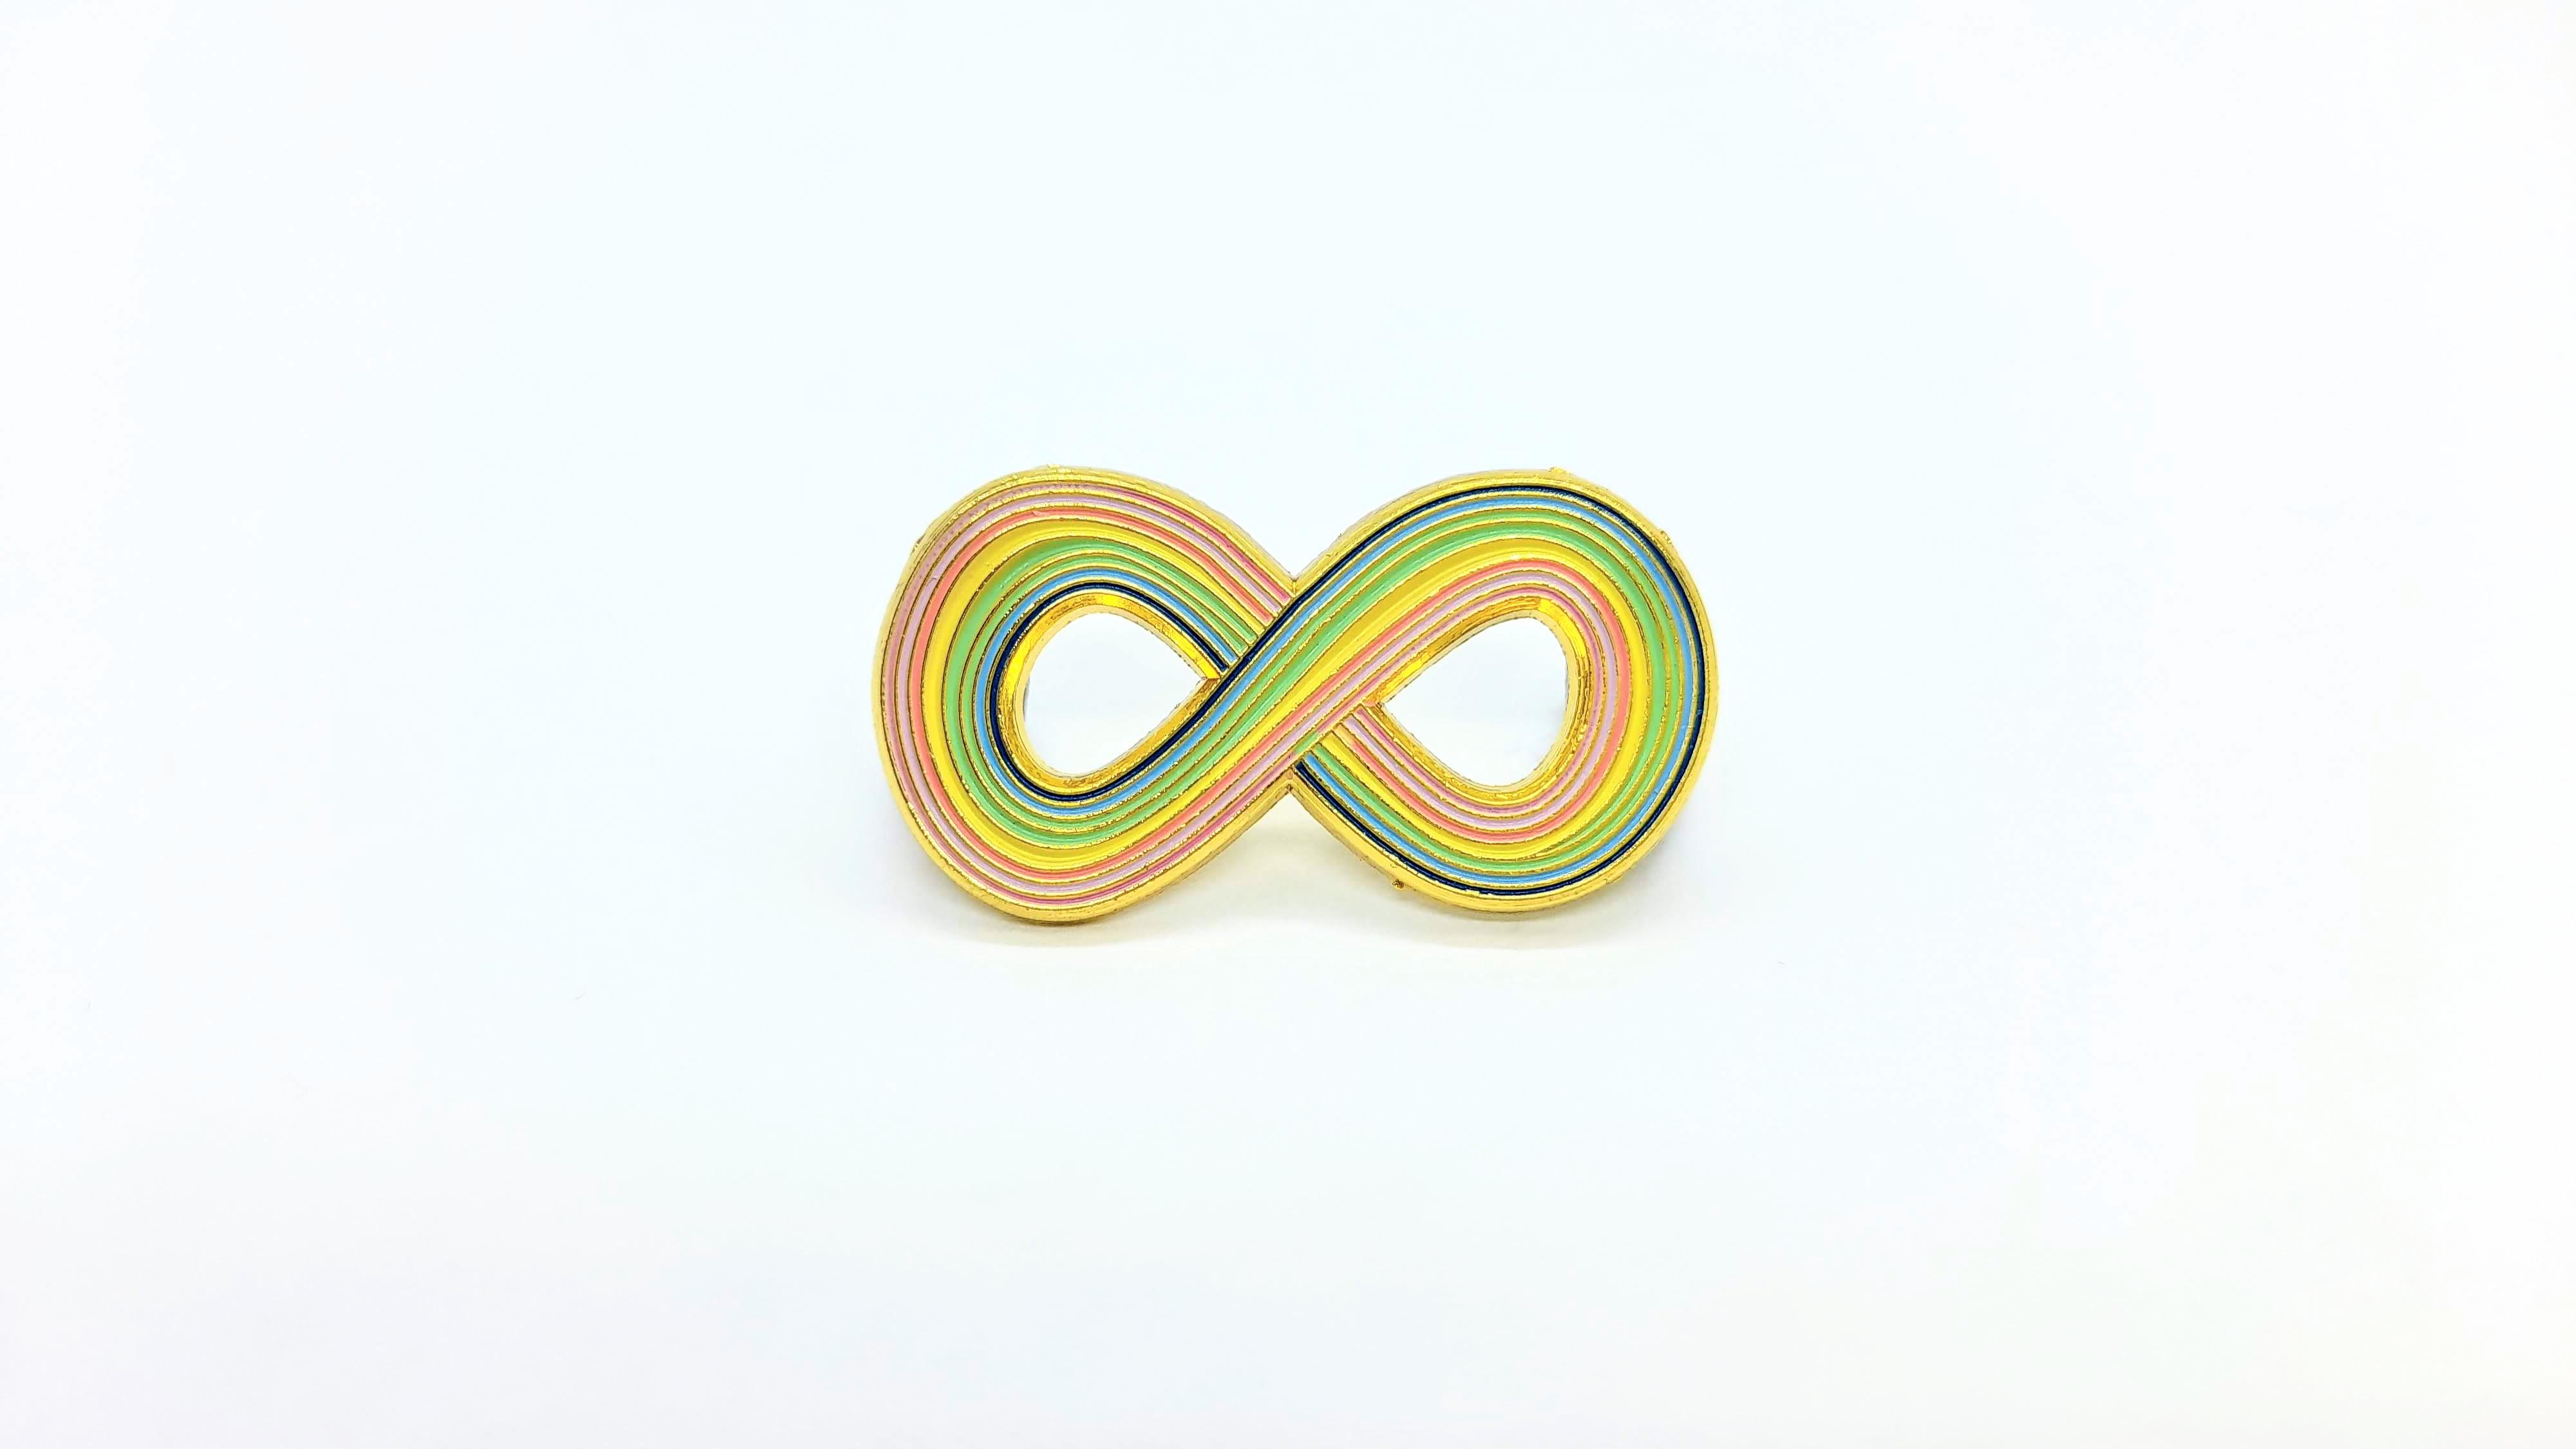 ILovePins Infinity Enamel Pin